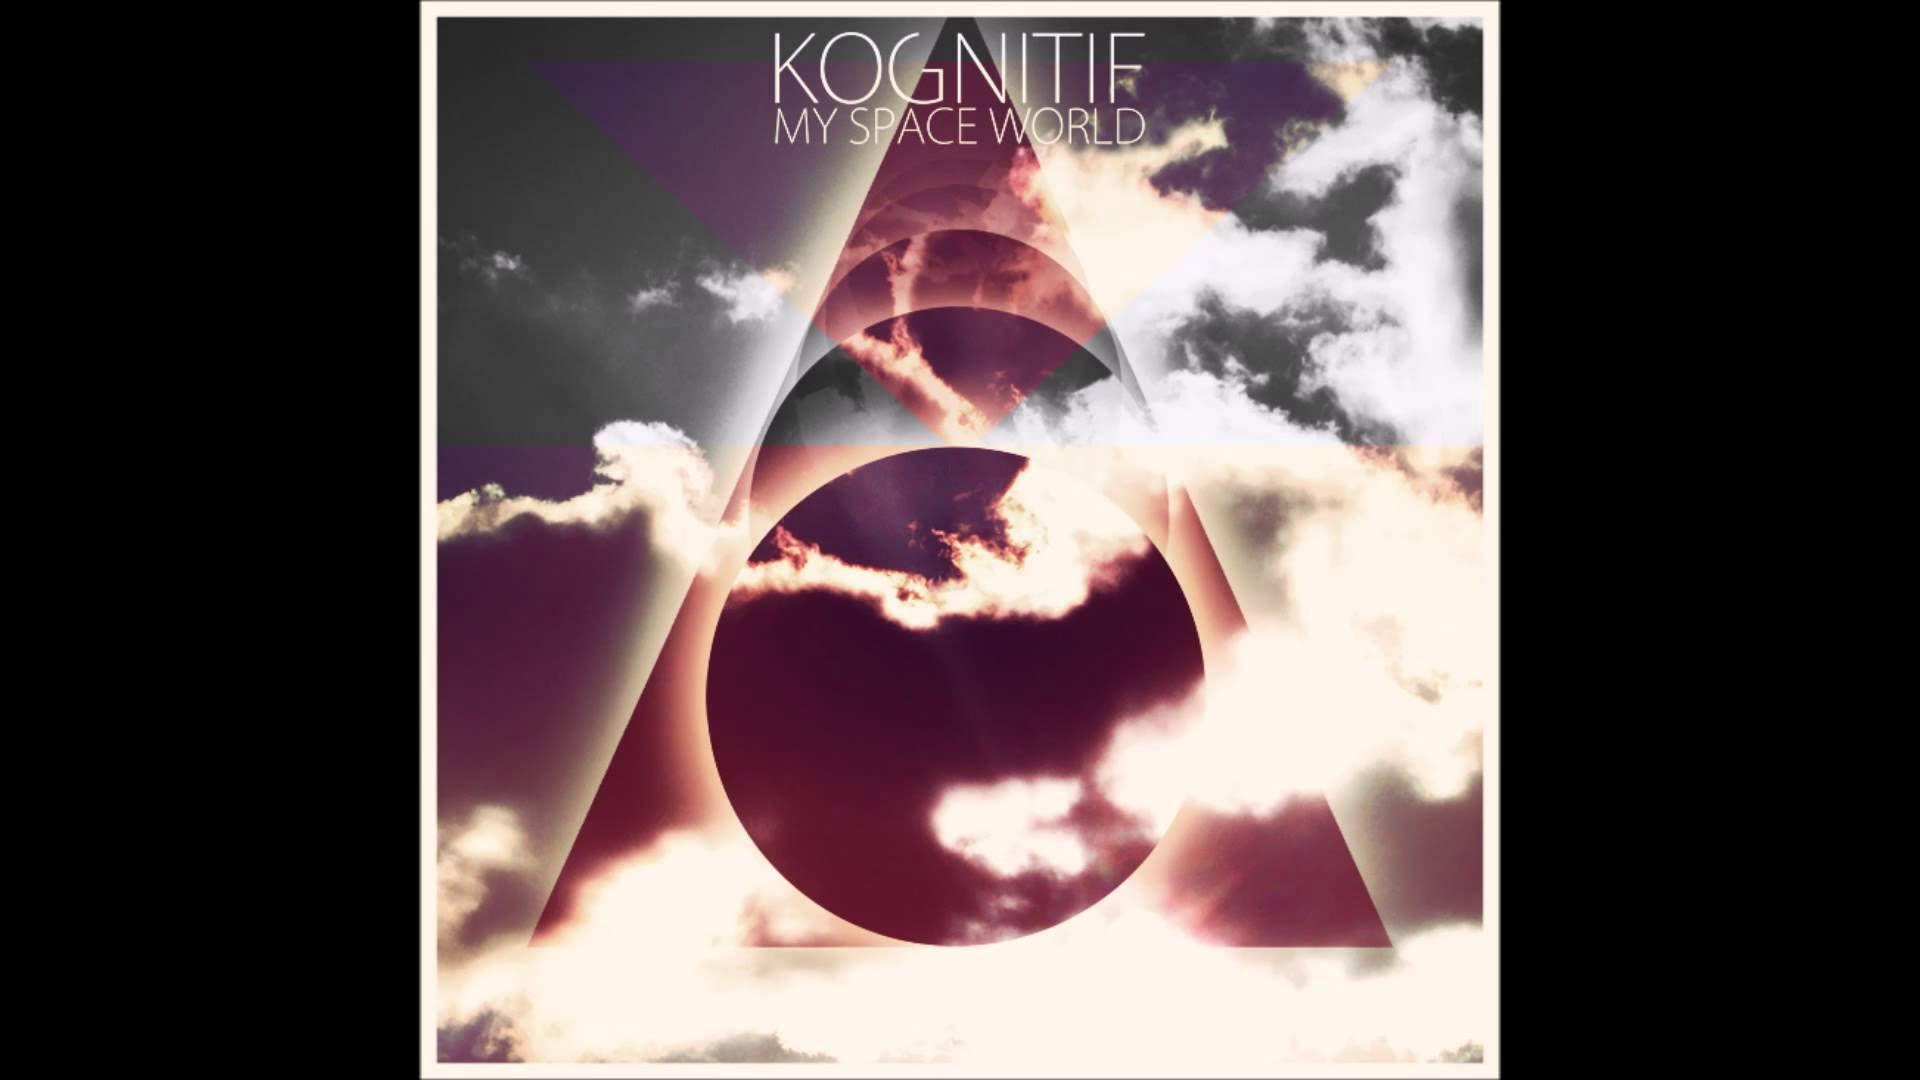 Kognitif - My Space World LP [Full Album]